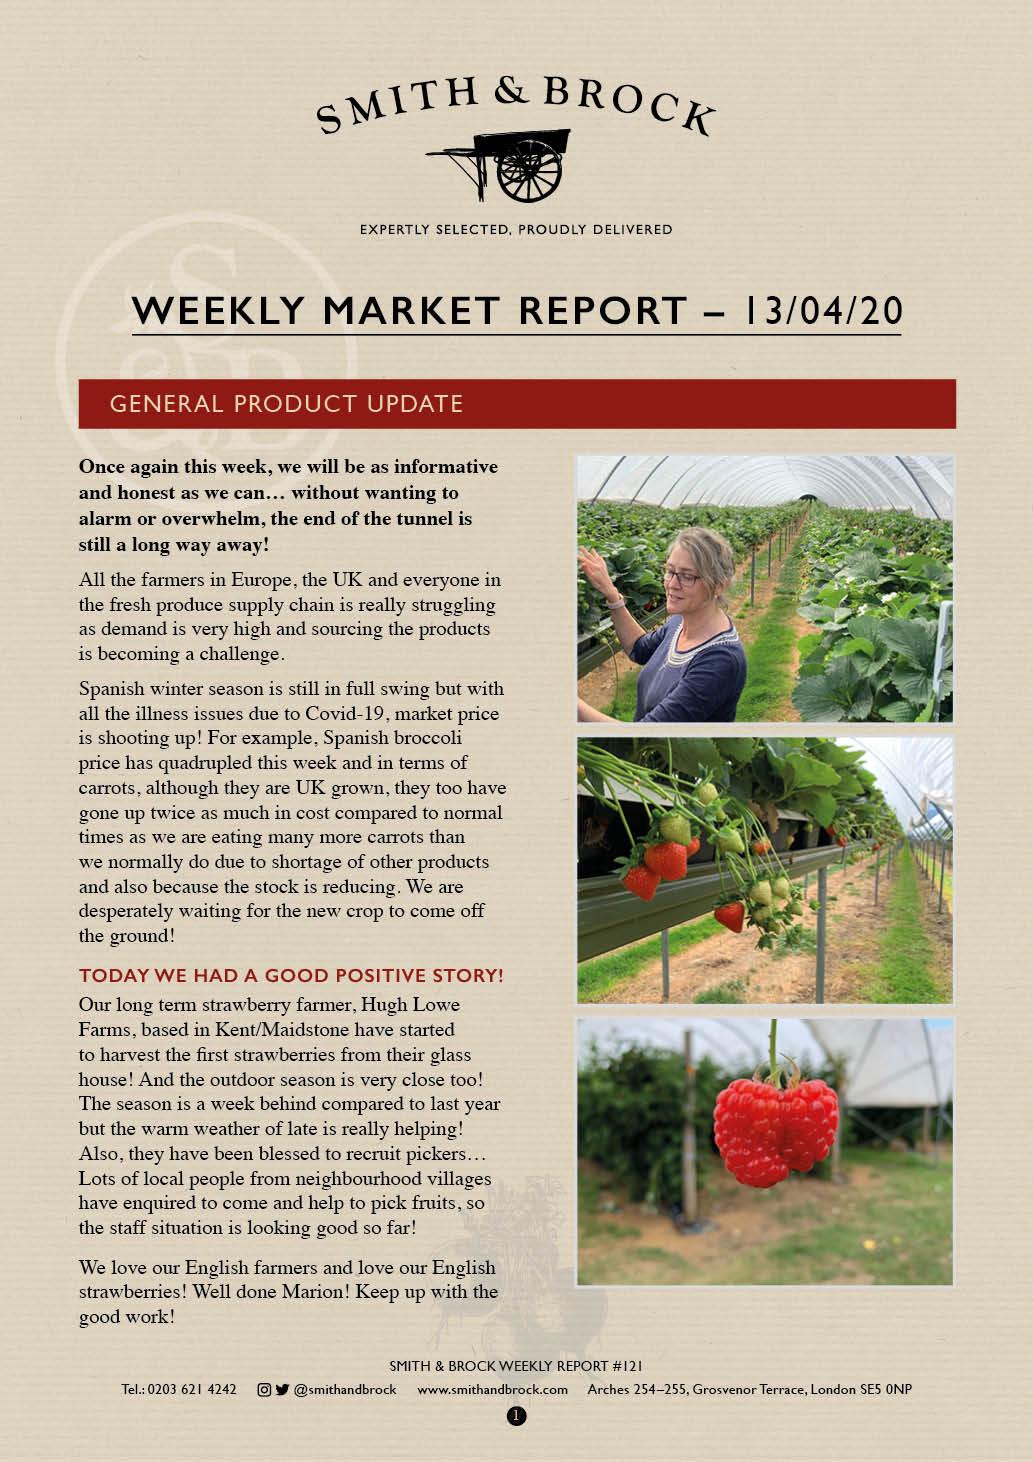 Smith&Brock Market Report 13 Apr 2020 121